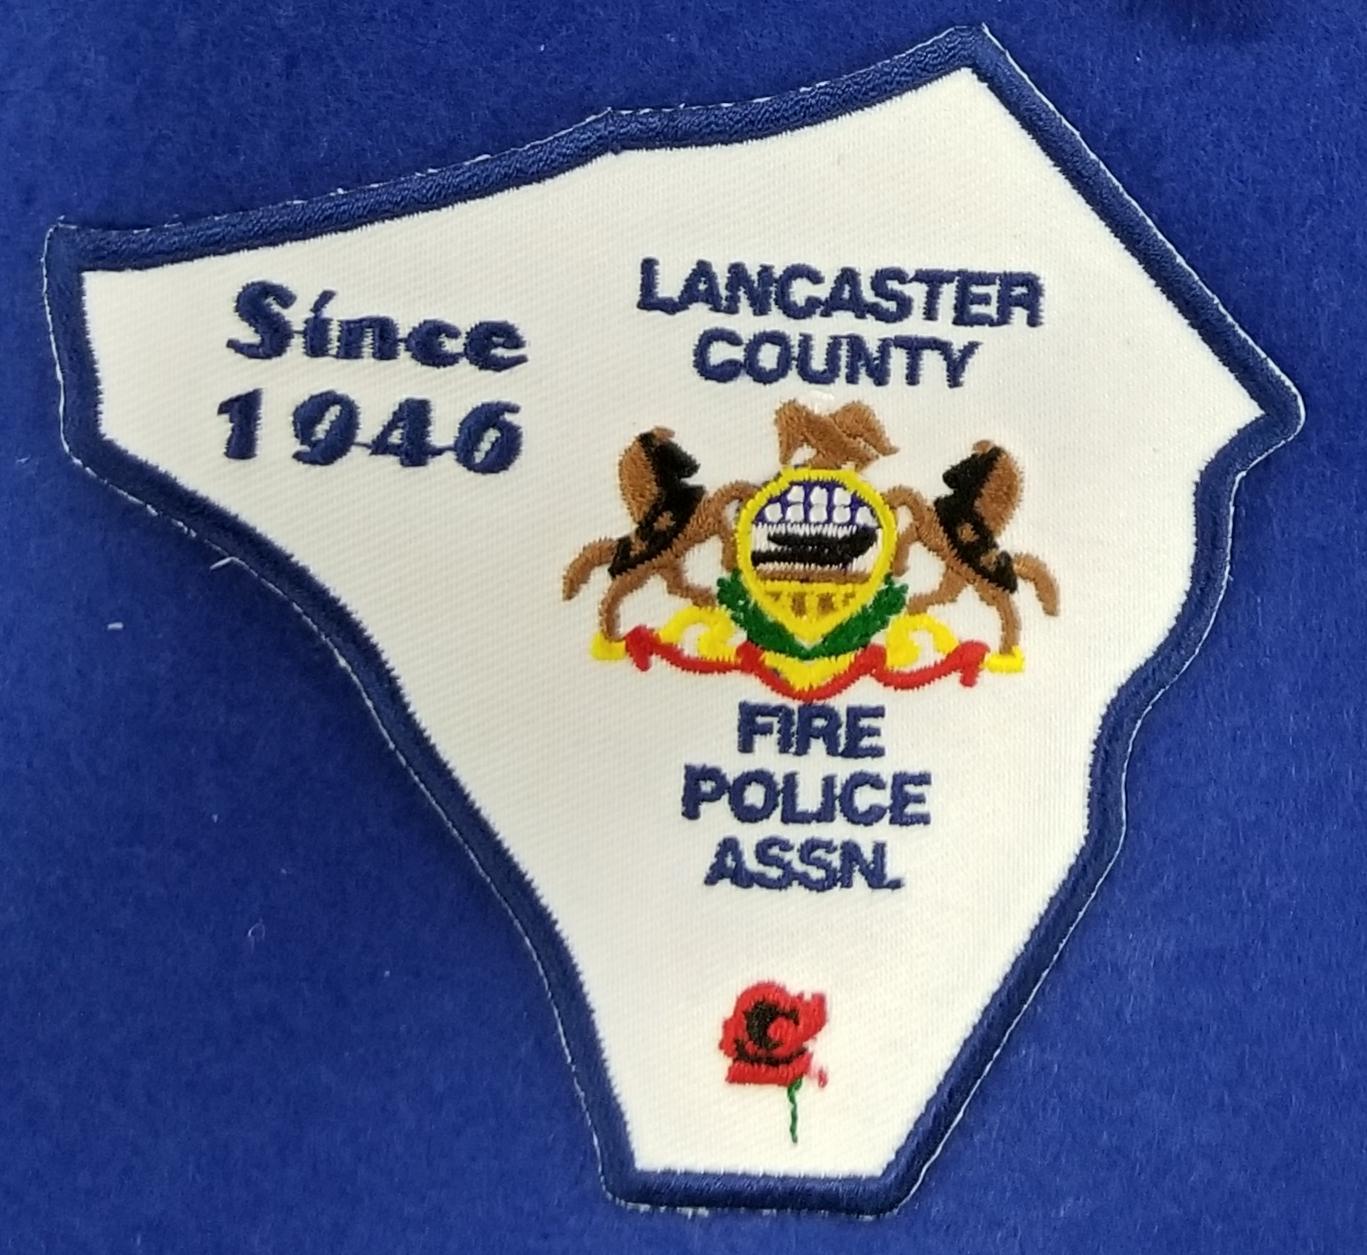 Lancaster County Fire Police Association